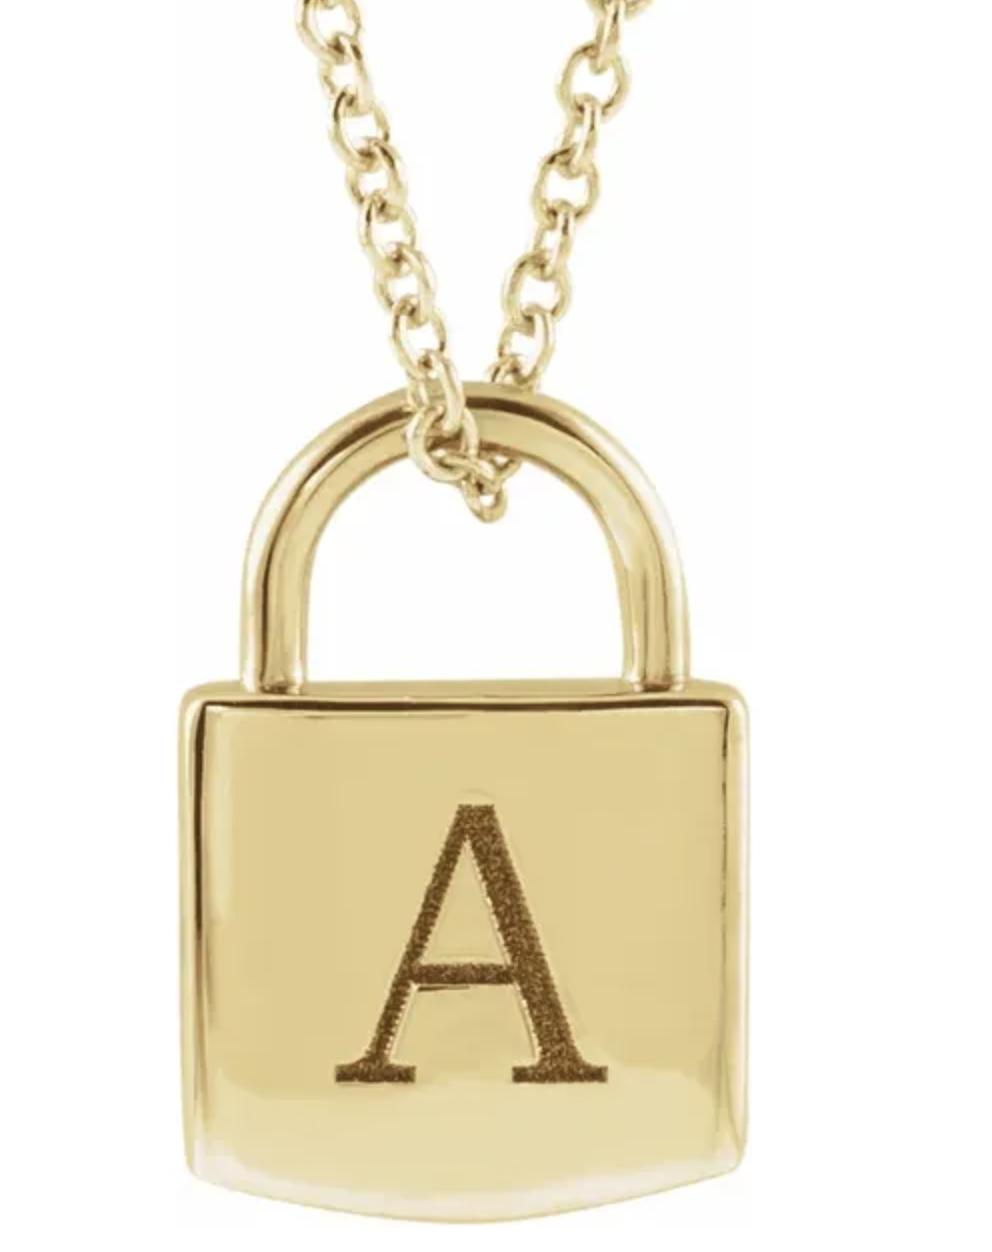 14kt Gold Engravable Lock Necklace